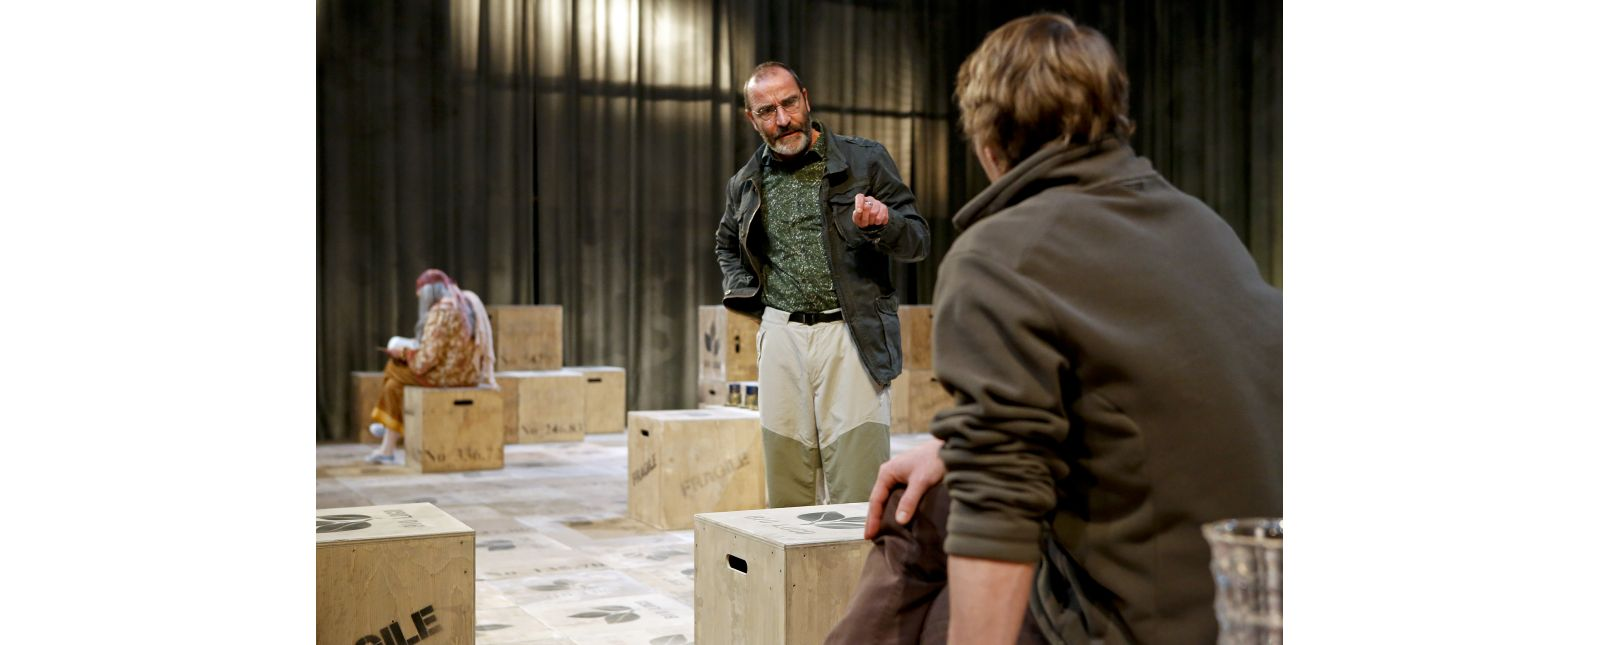 Onkel Wanja // Margot Gödrös // Henry Meyer // Martin Hohner //  2019 // Foto: Birgit Hupfeld